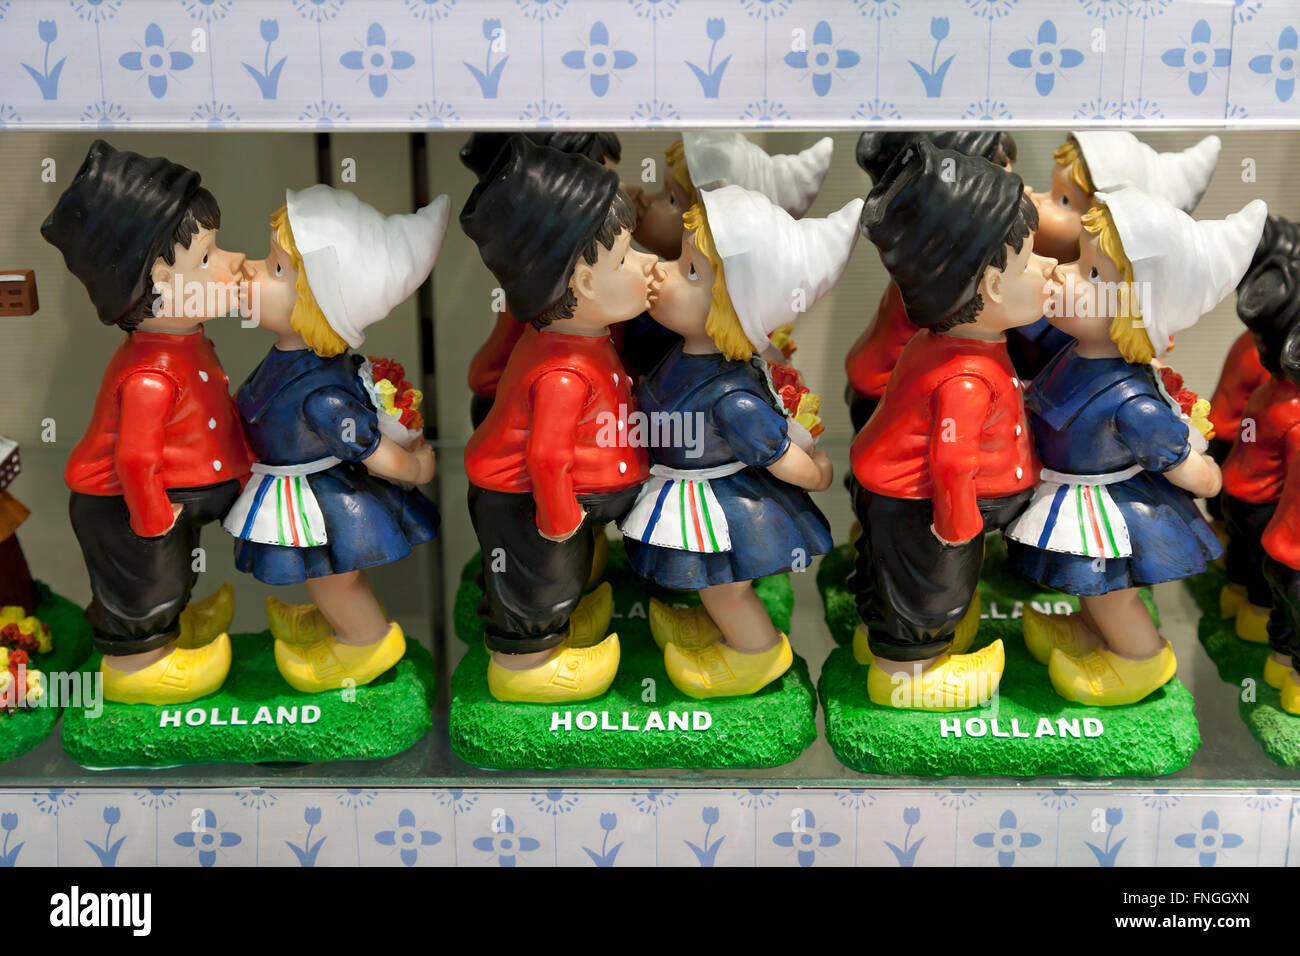 Dutch farmers couple figurine as souvenir - Stock Image